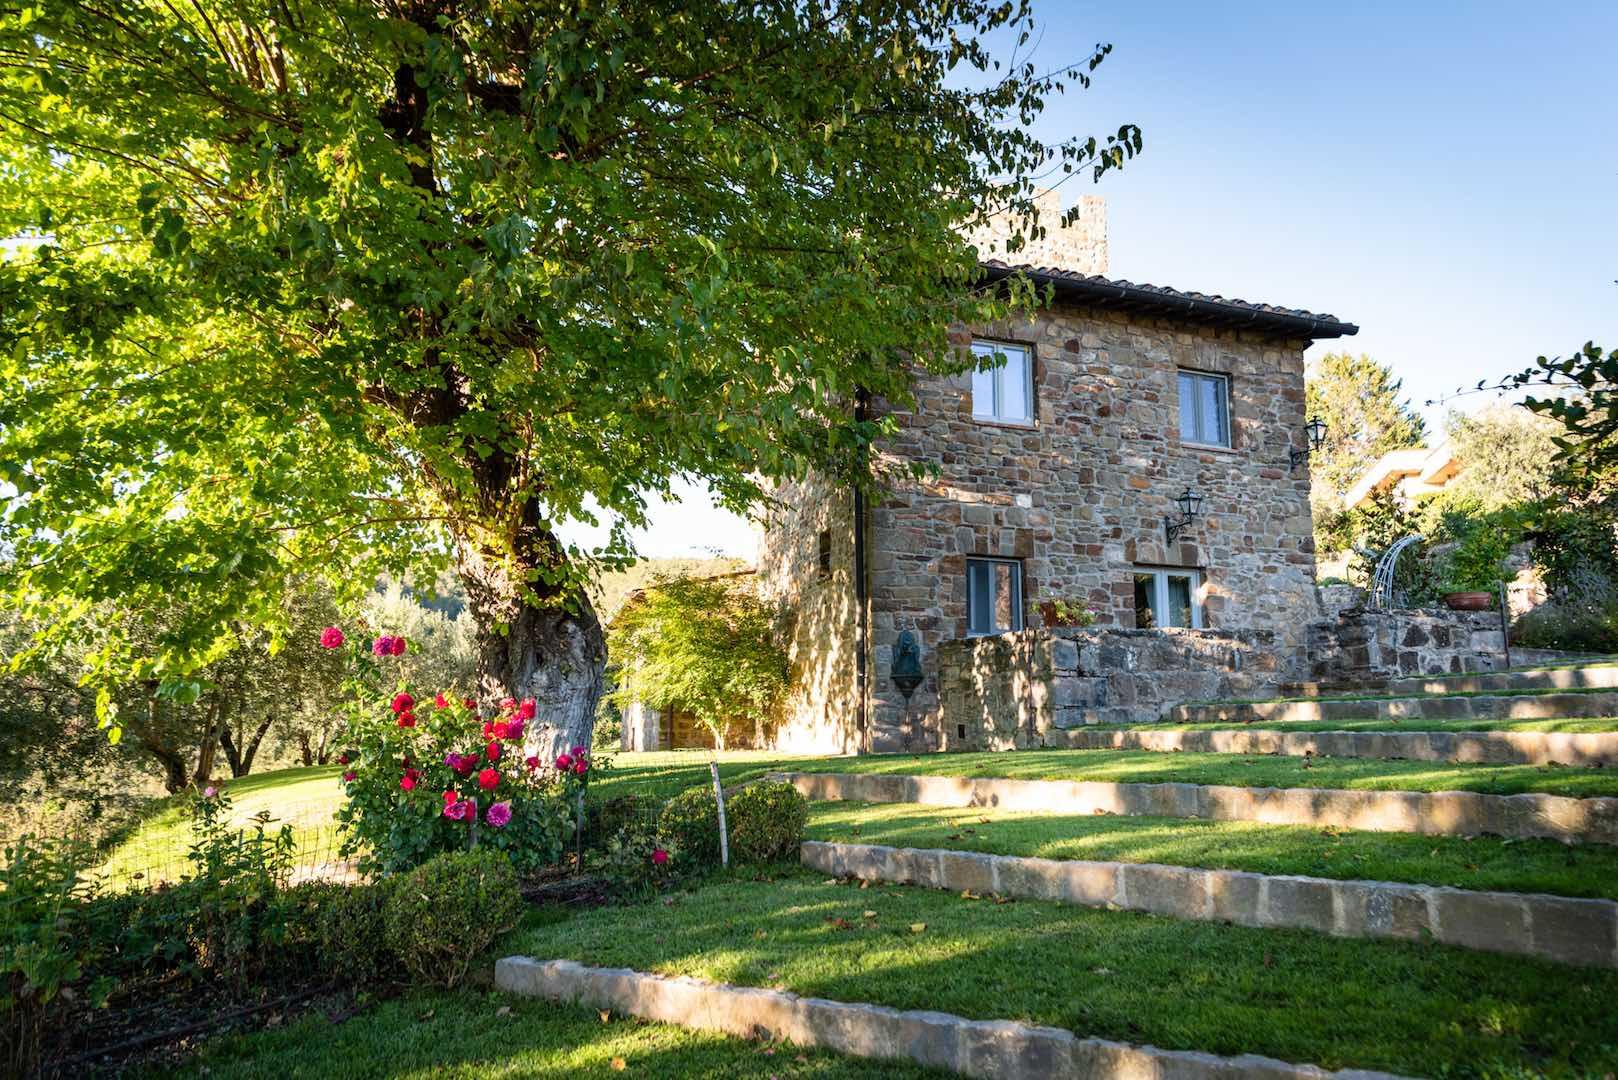 Chianti Classico Wine | Tuscan Vineyard and Winery - Montemaggio